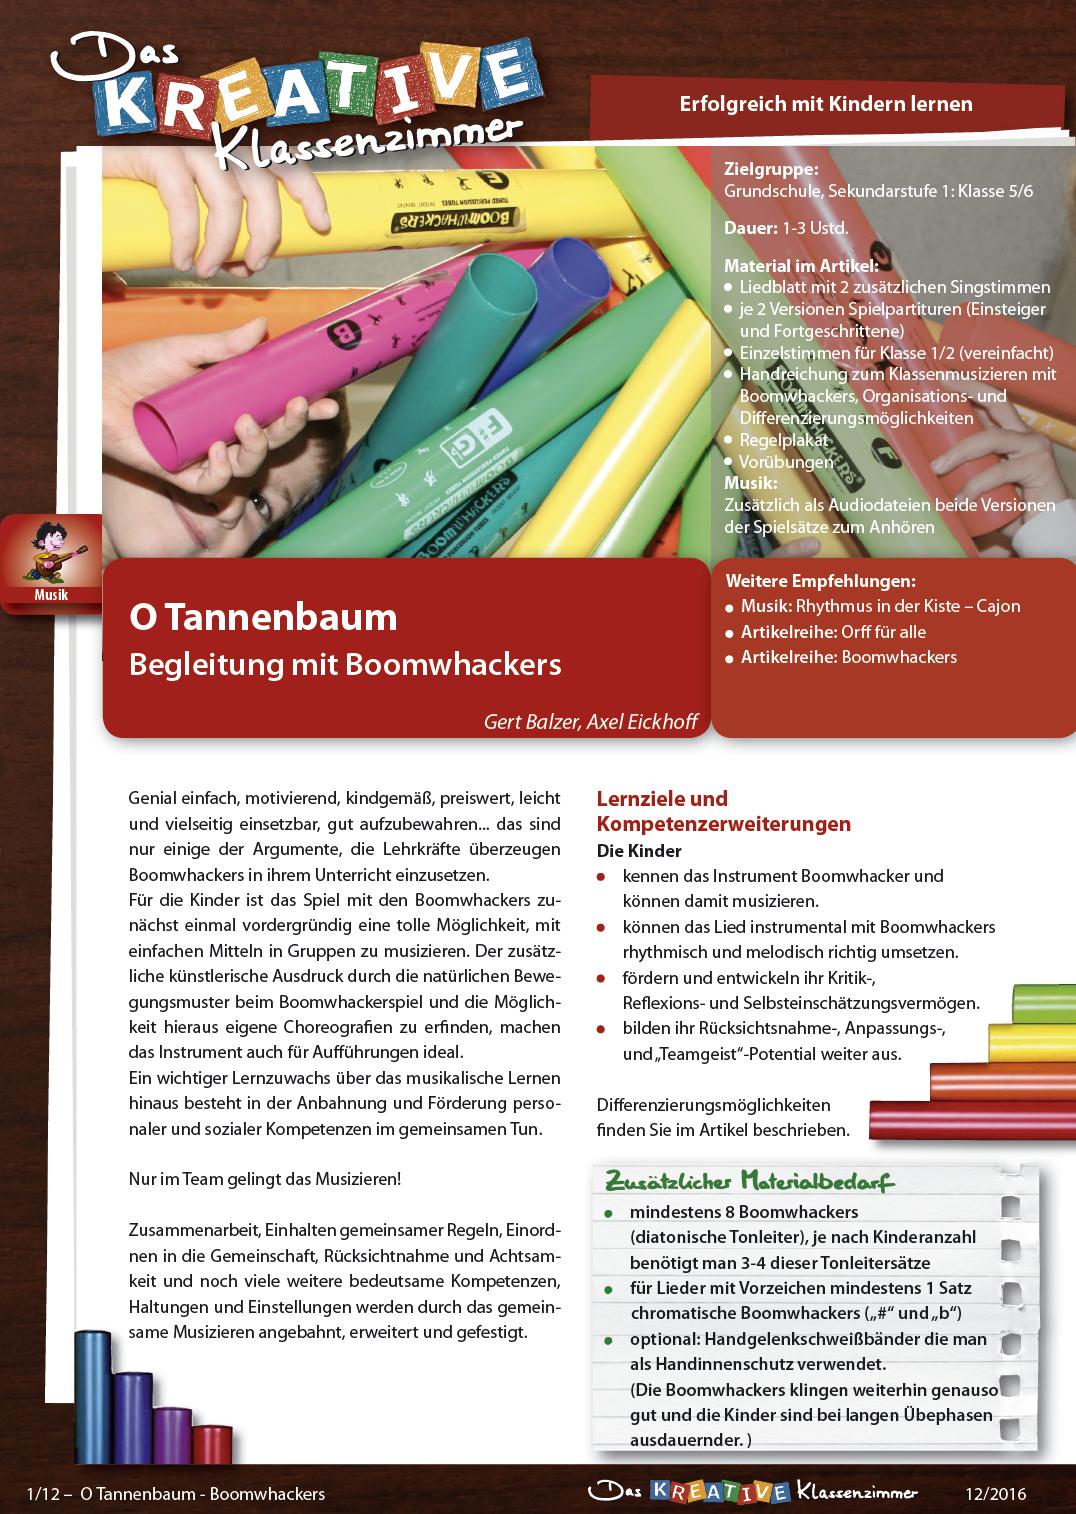 O Tannenbaum - Boomwhackers